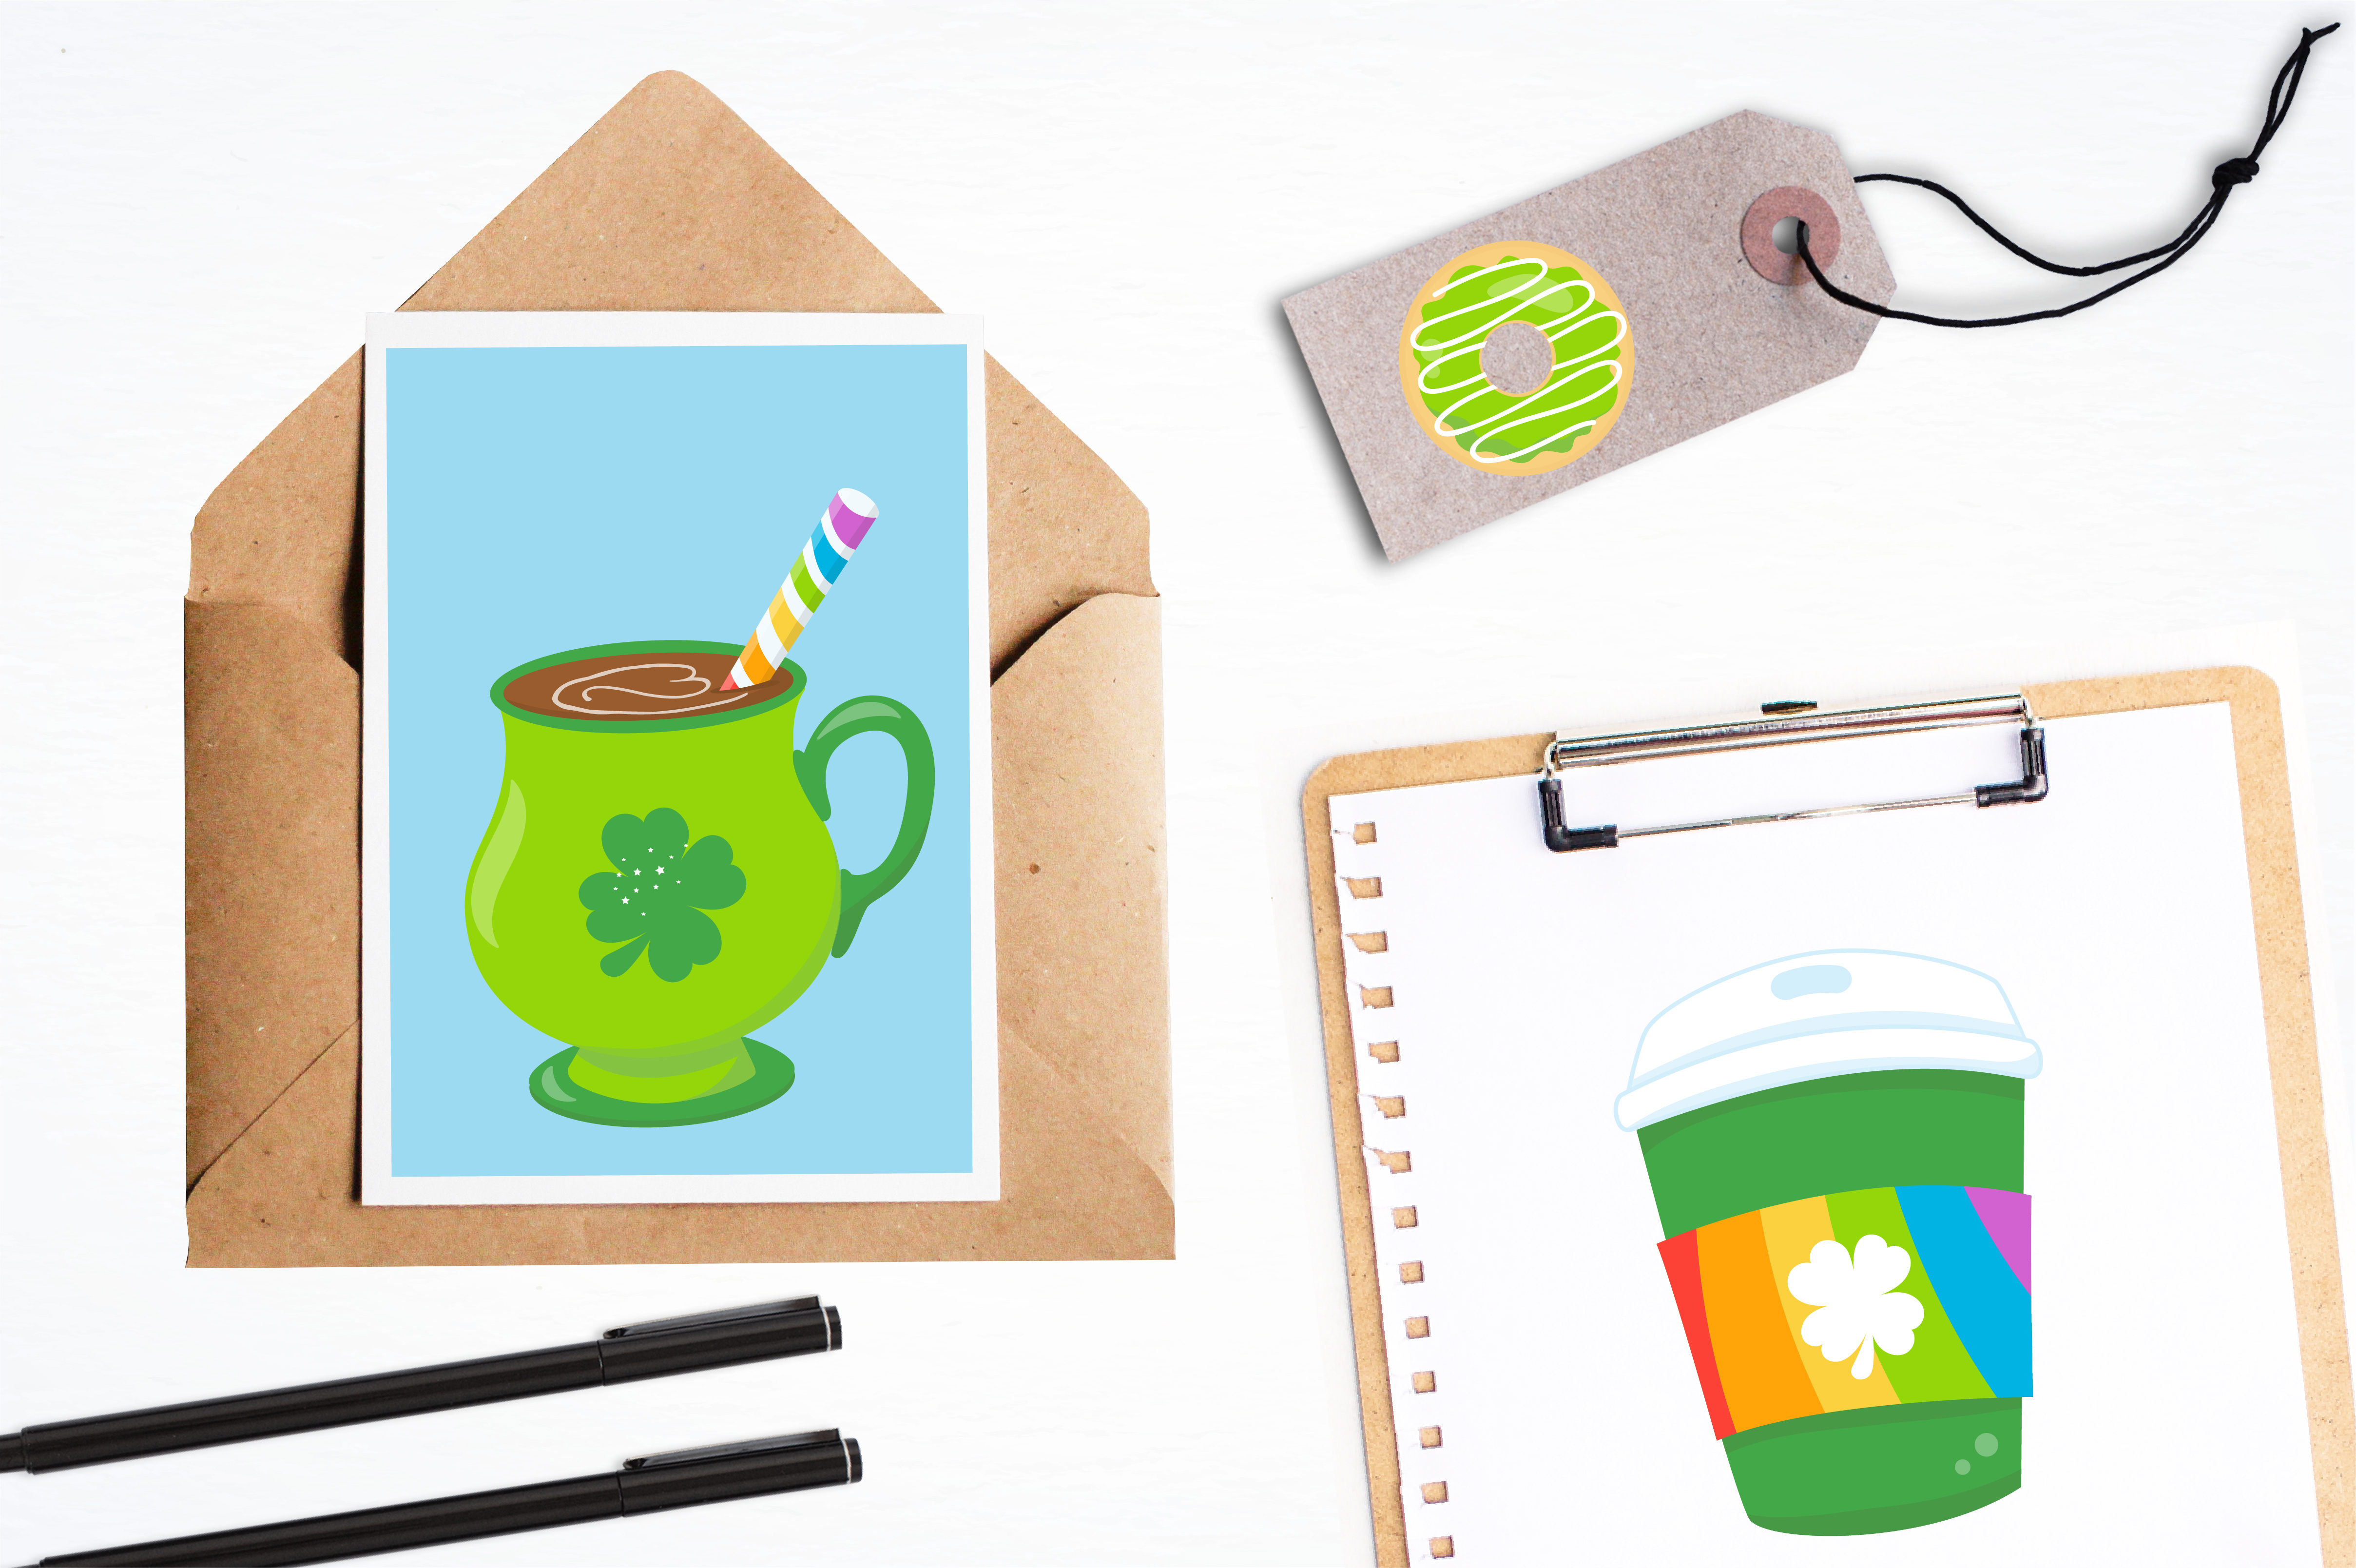 Irish coffee graphics and illustrations example image 4